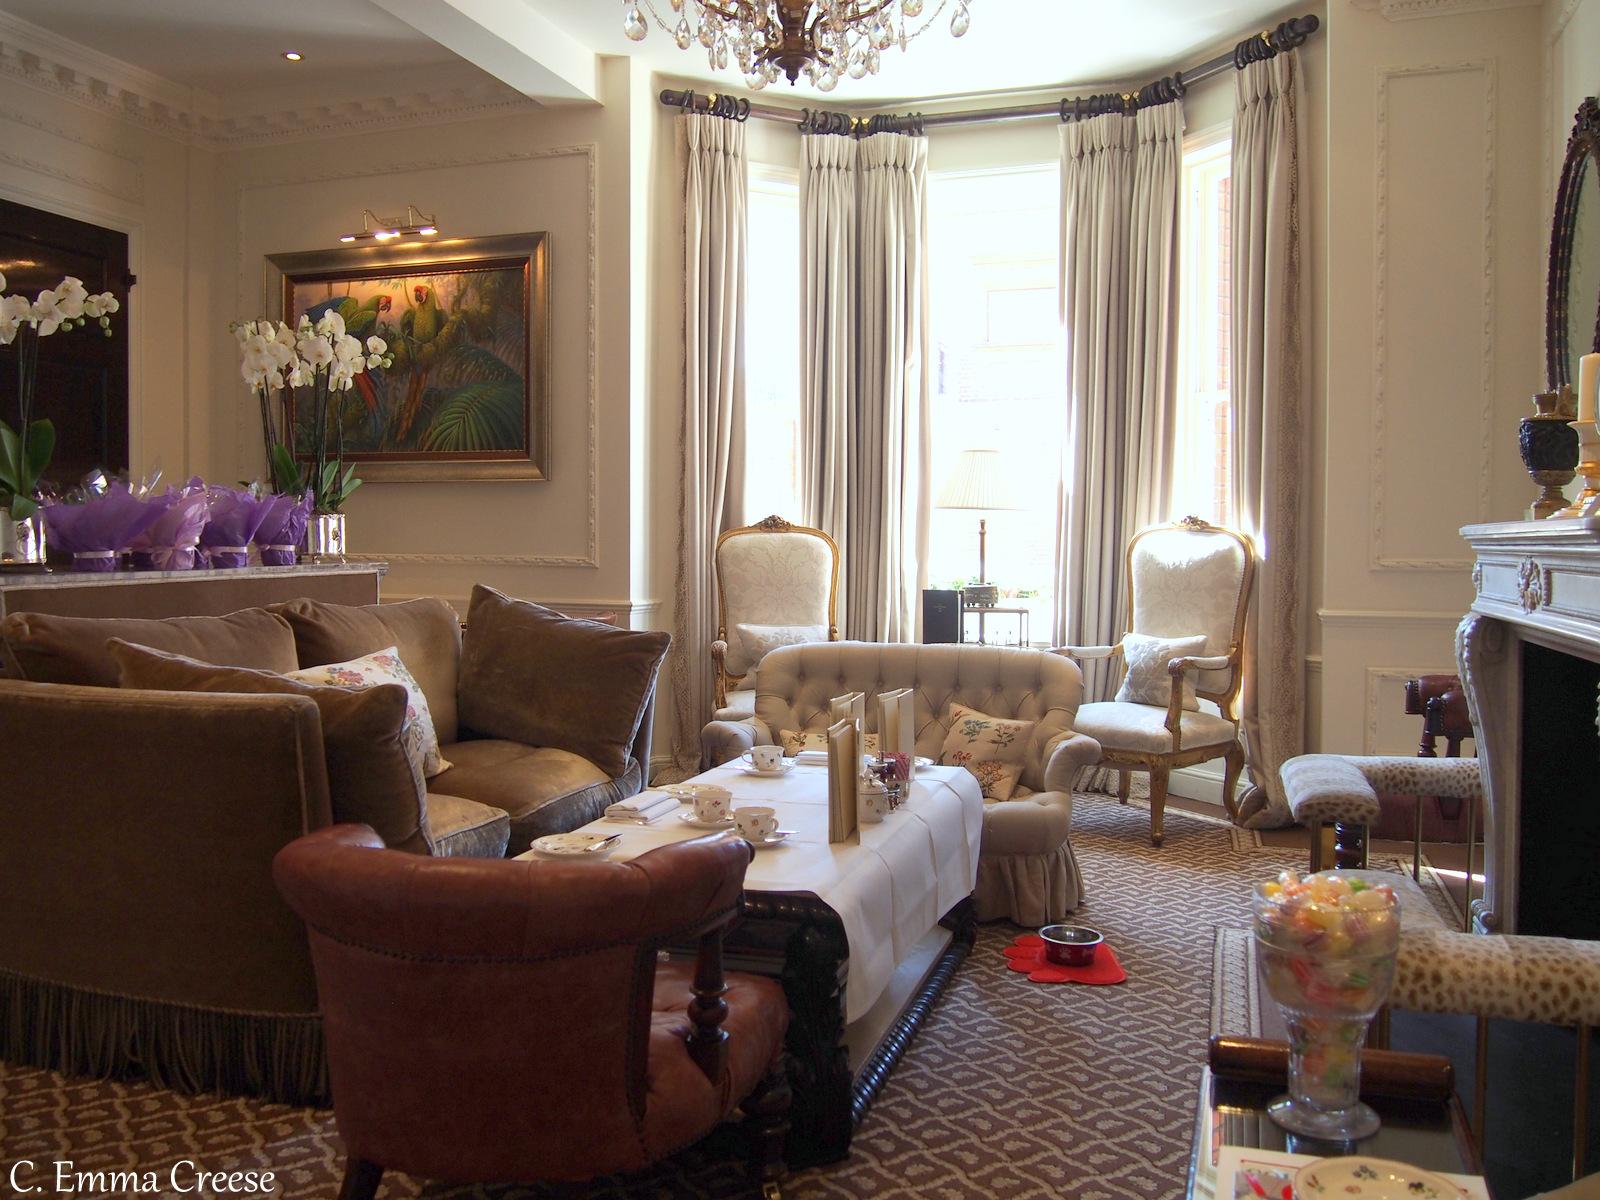 Luxury Afternoon Tea Egerton Hotel Kensington Adventures of a London Kiwi